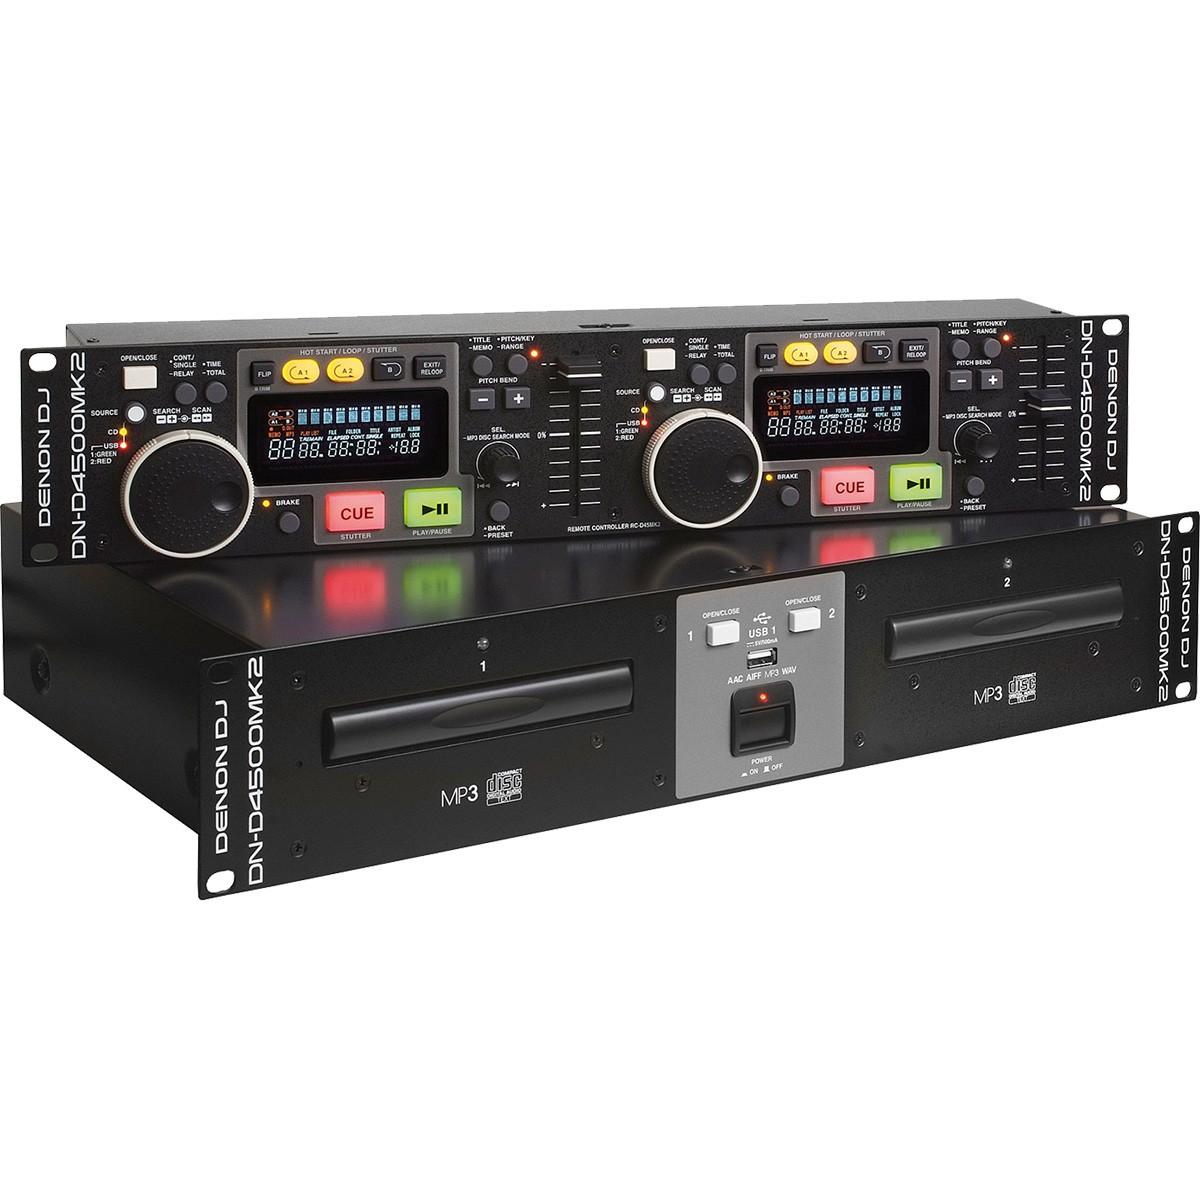 Denon DN-D4500 MK II CD/MP3 Player Duplo, 220v